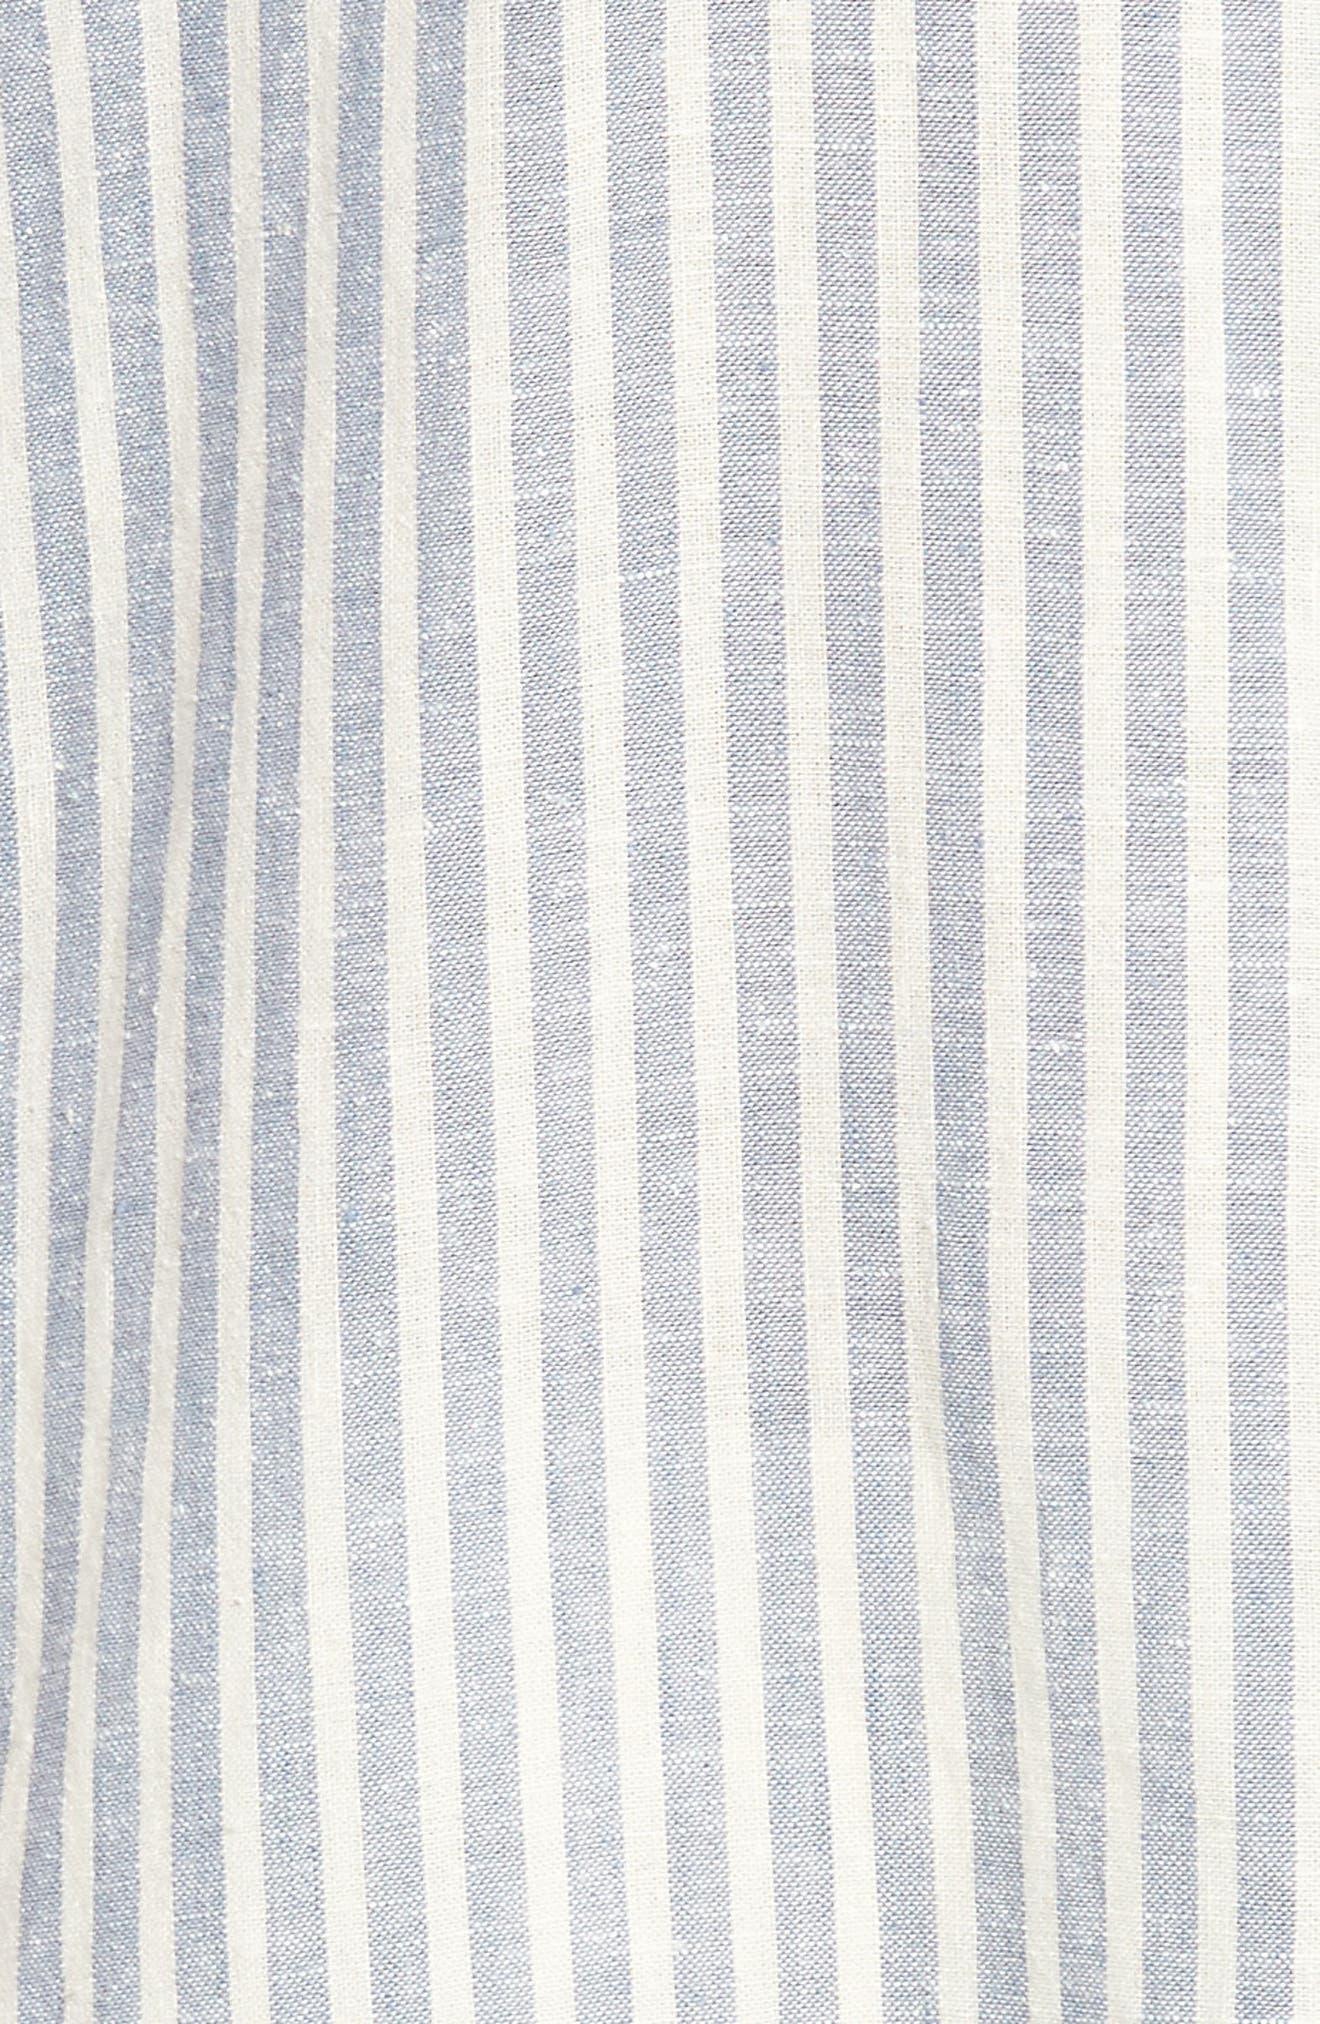 Stripe Tunic Top,                             Alternate thumbnail 6, color,                             Chambray